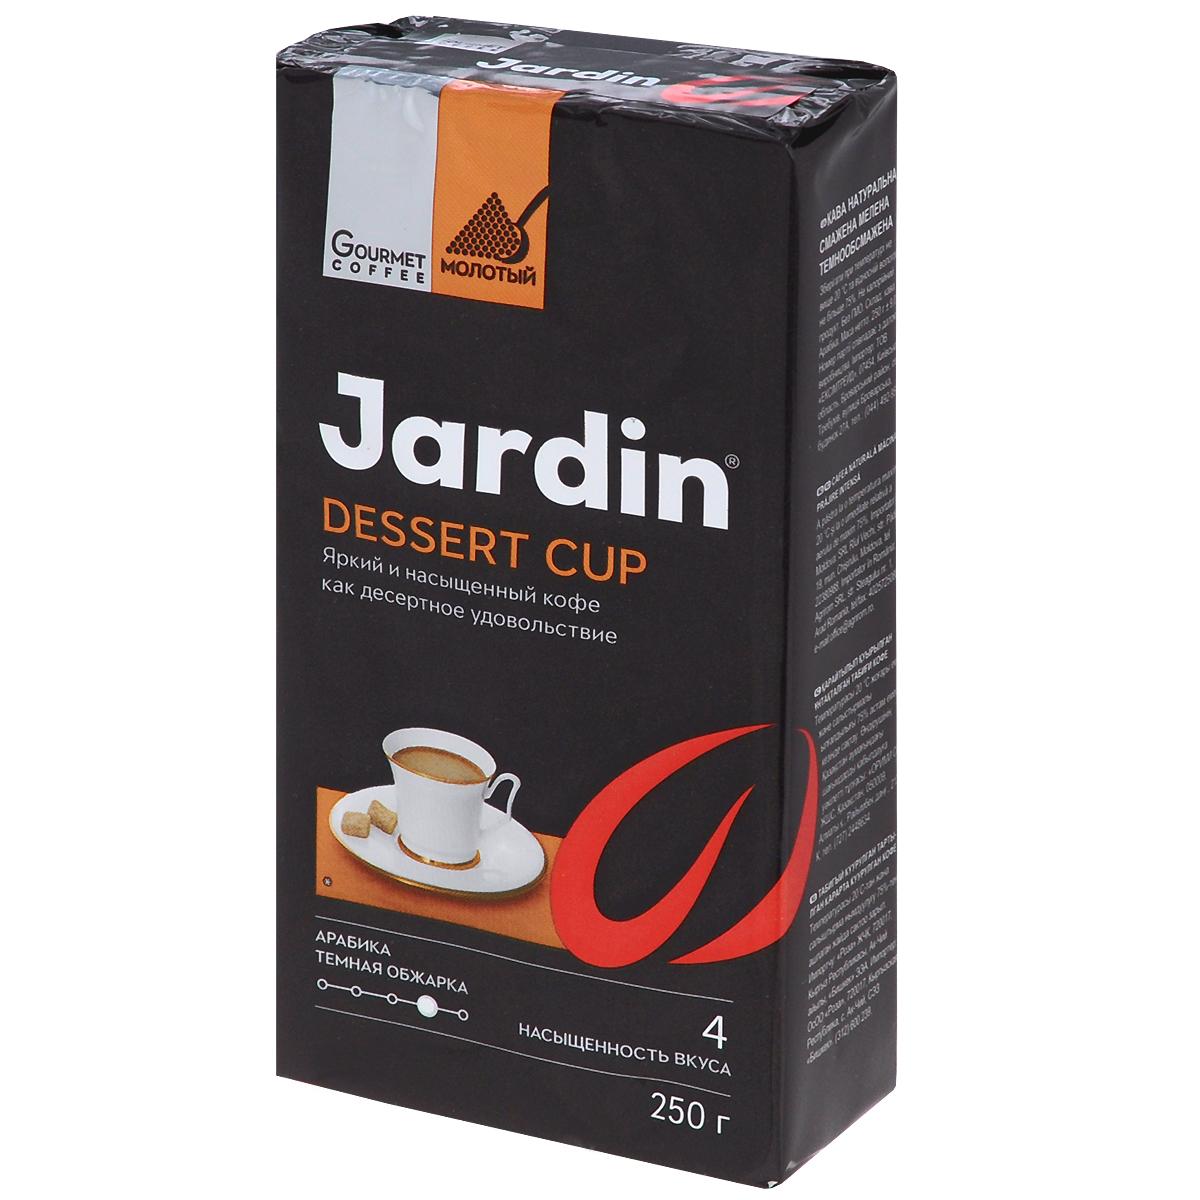 Jardin Dessert Cup кофе молотый, 250 г